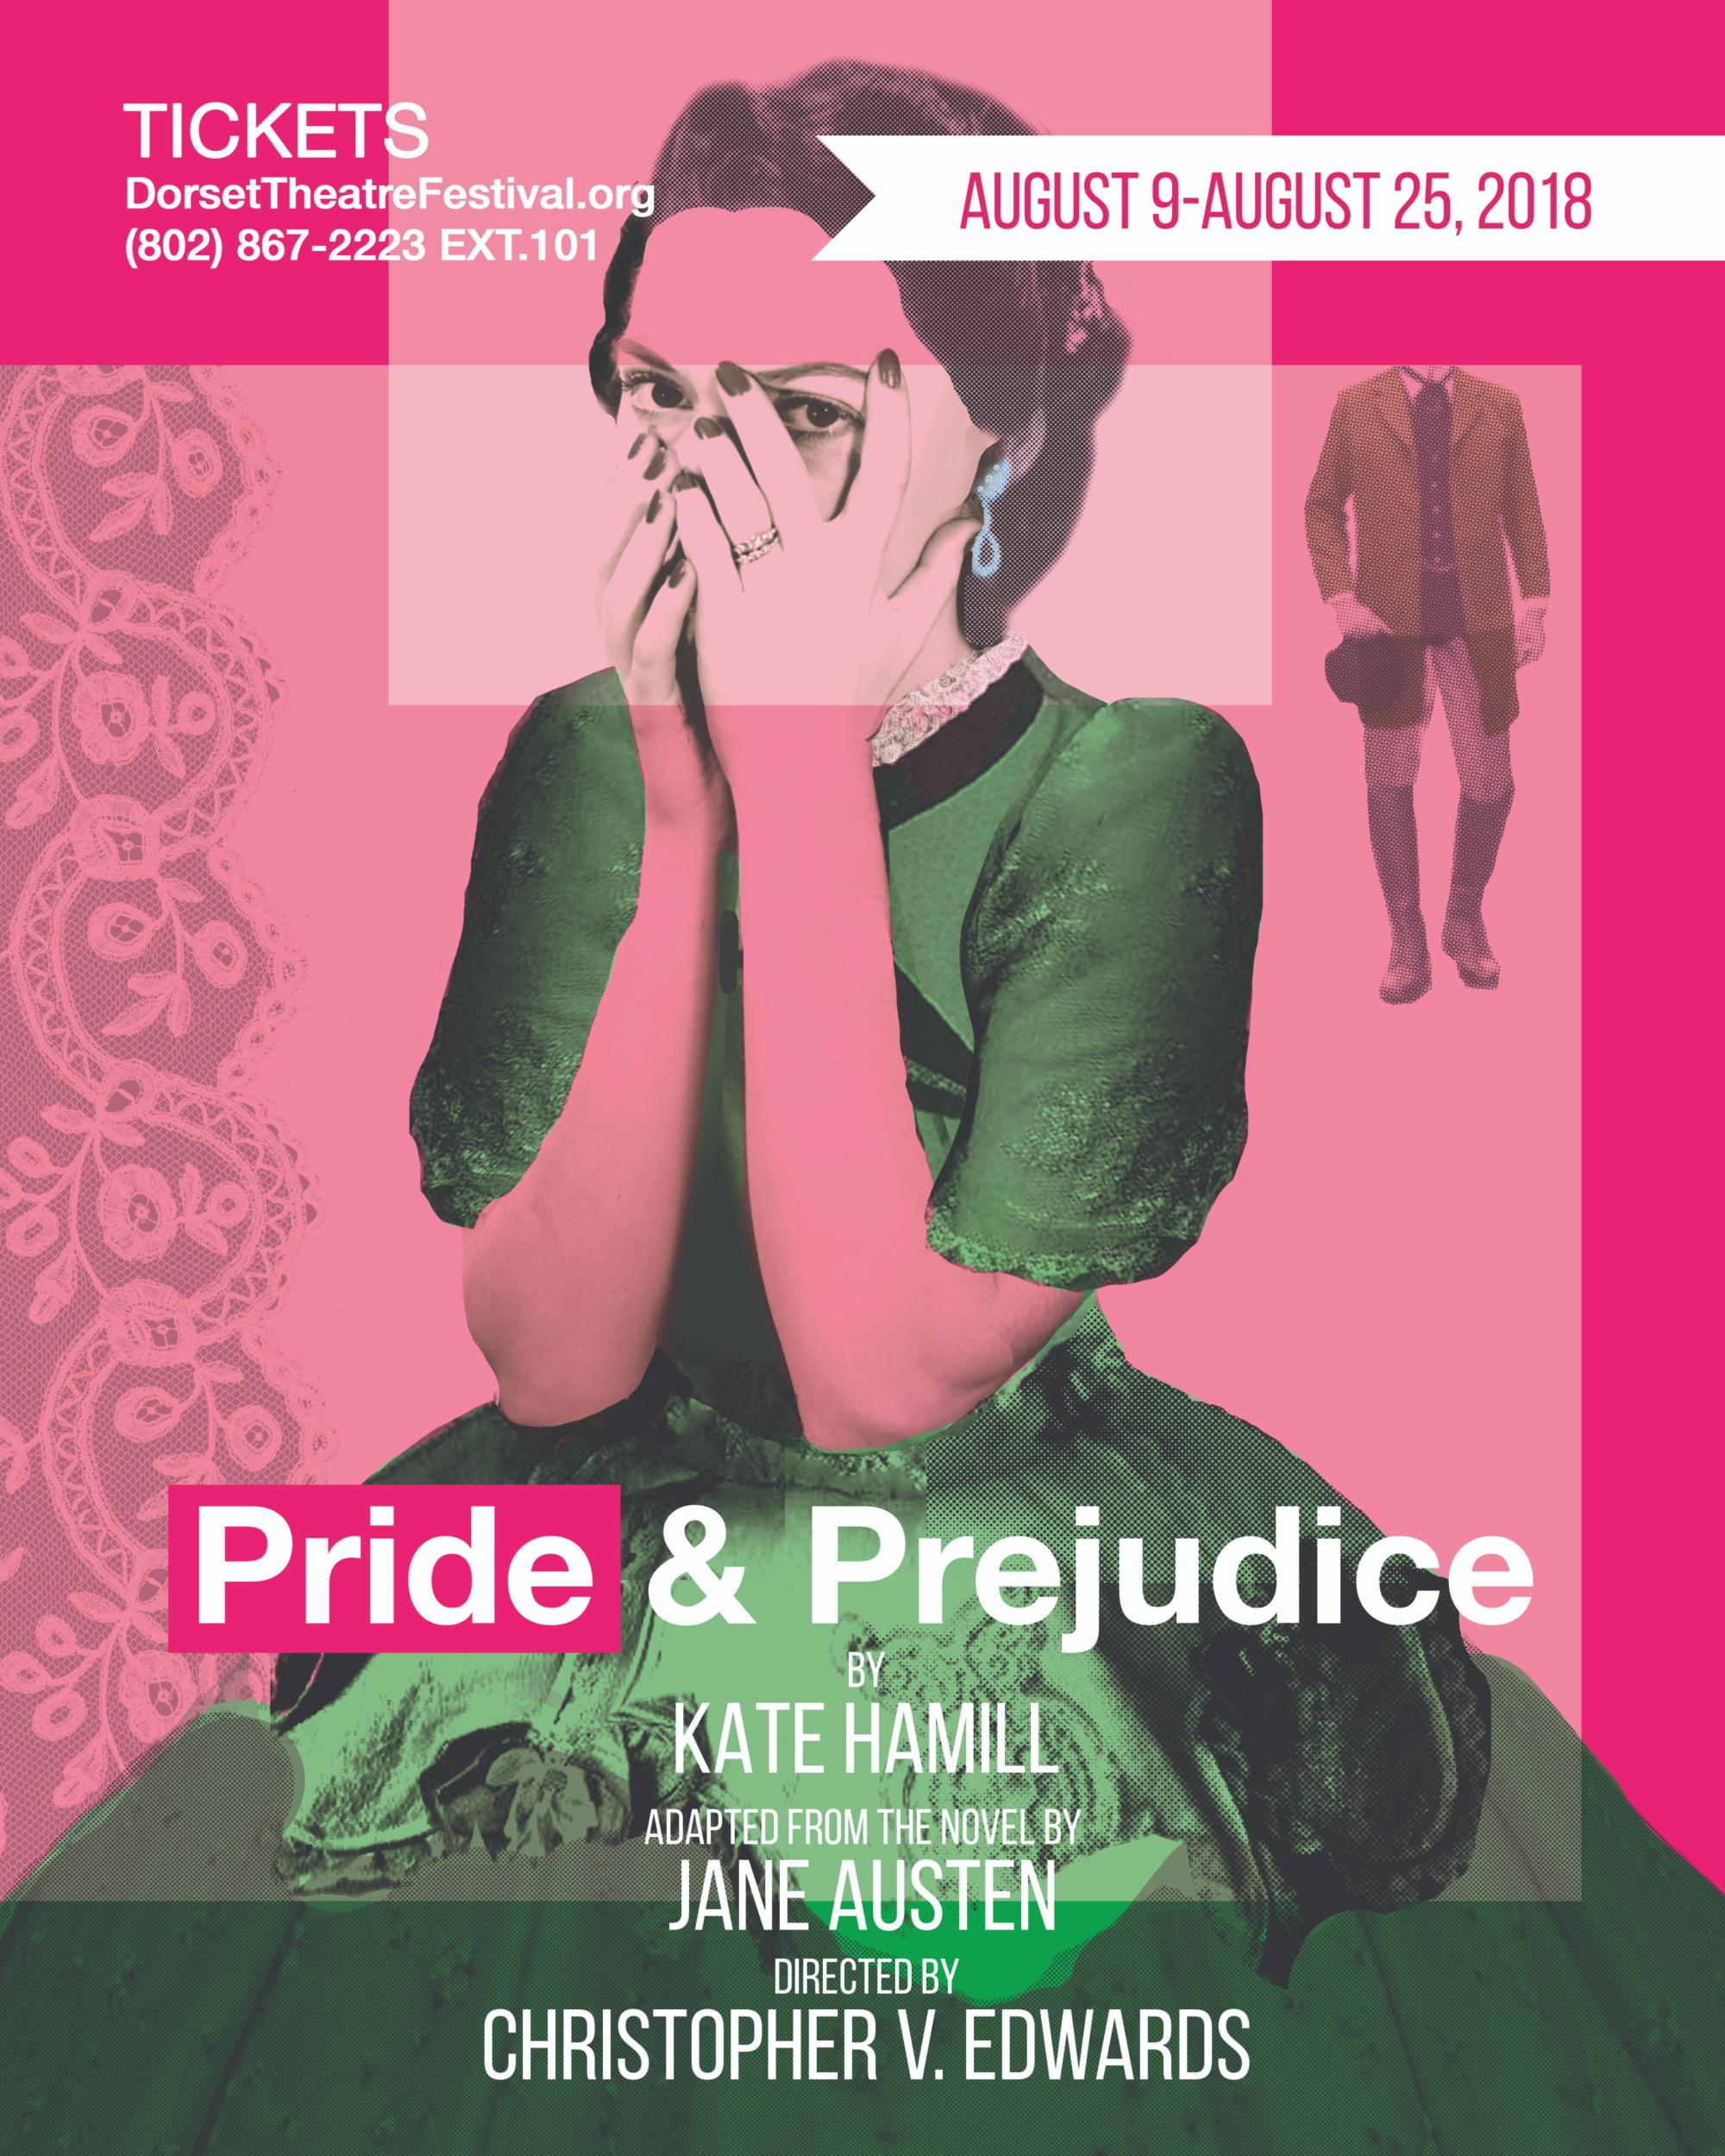 pride-and-prejudice-show-image.jpg